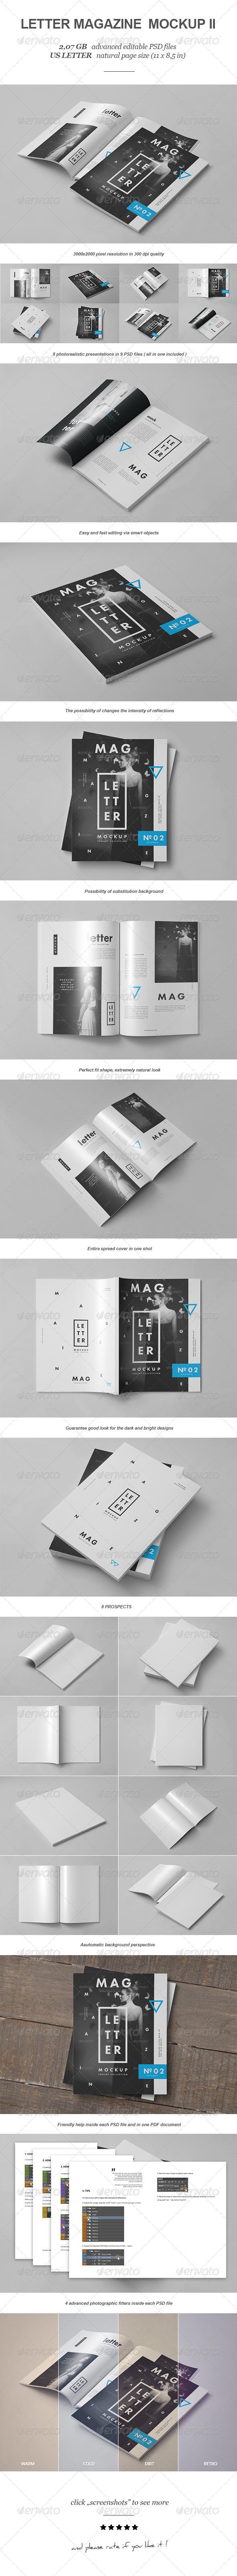 Letter Magazine / Brochure Mock-up II - Magazines Print